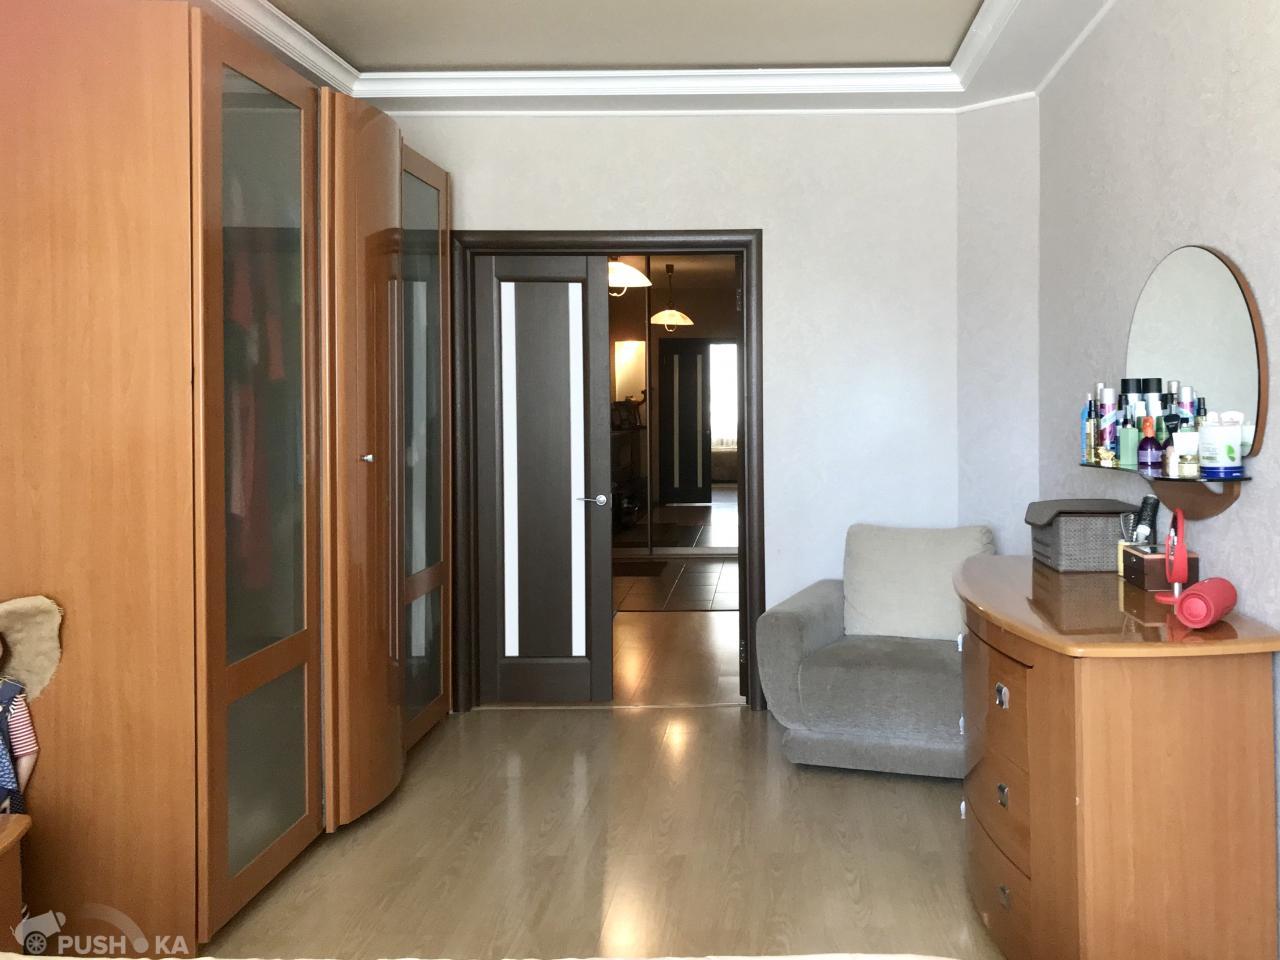 Продаётся 2-комнатная квартира 74.0 кв.м. этаж 8/11 за 4 000 000 руб